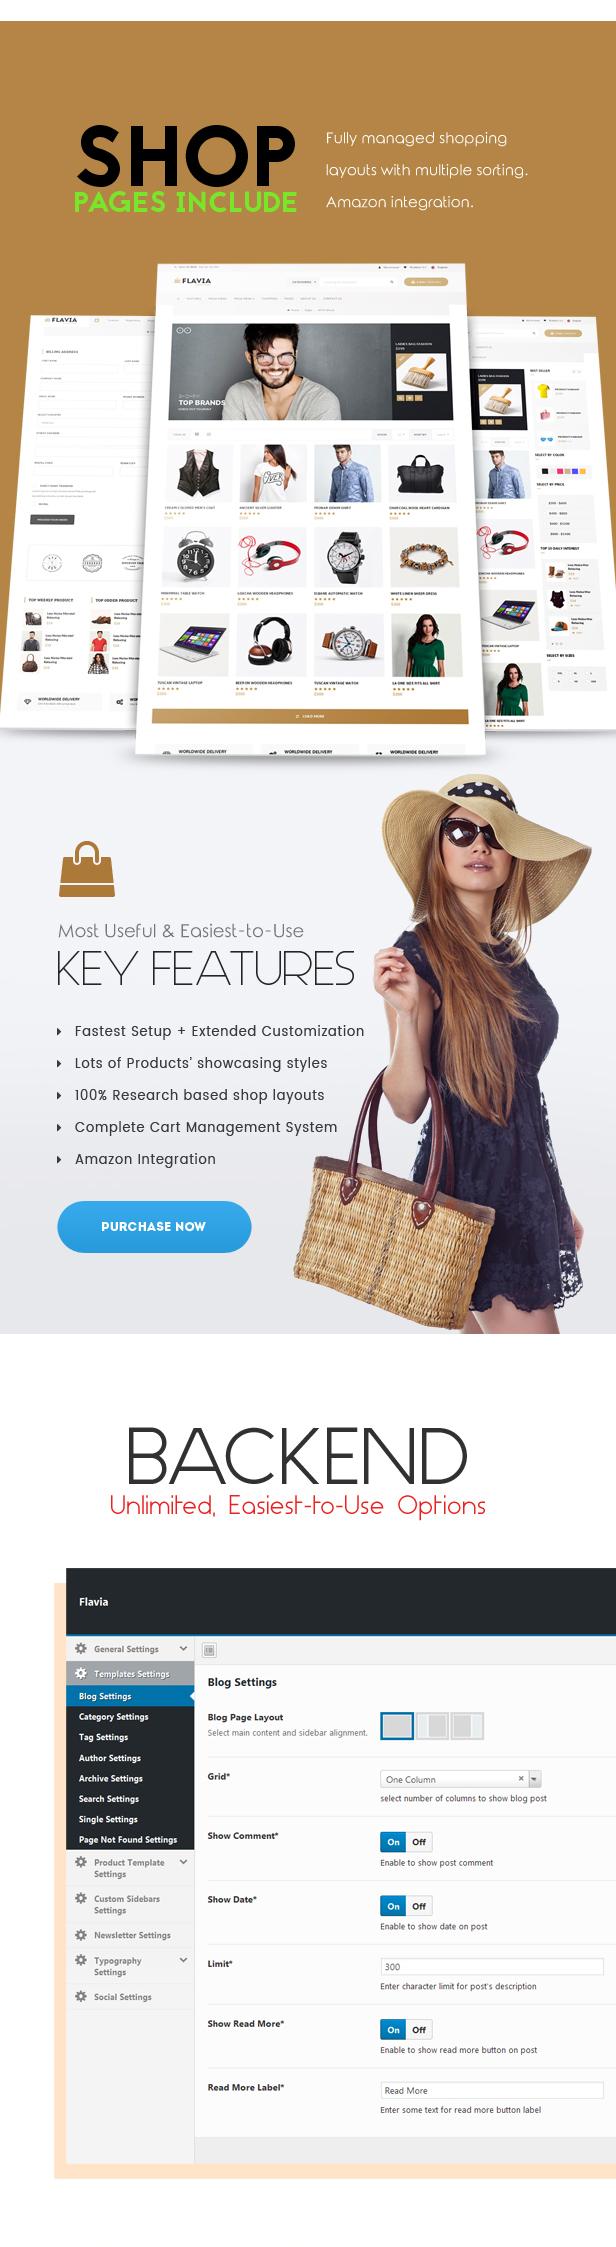 Flavia - Download Responsive WooCommerce WordPress Theme 2020 - 10